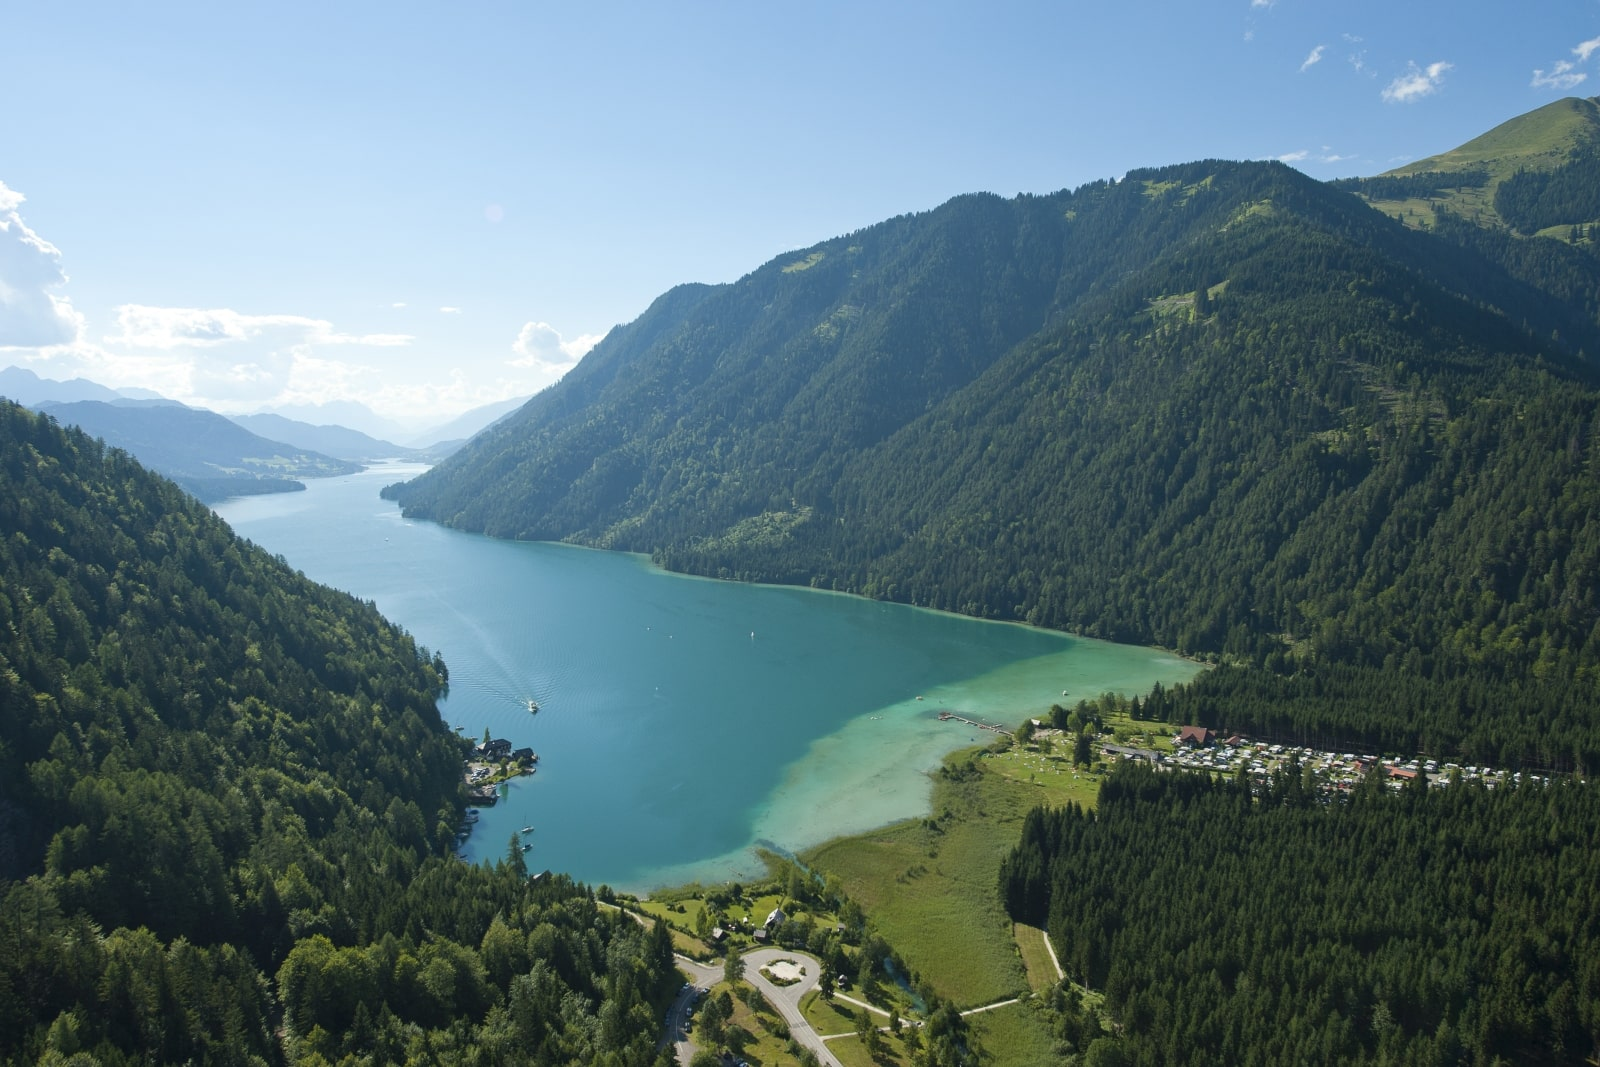 Heidi-Chalet-Falkert-Heidialm-Natur-See-Baden-saubere-Bergseen-Weissensee